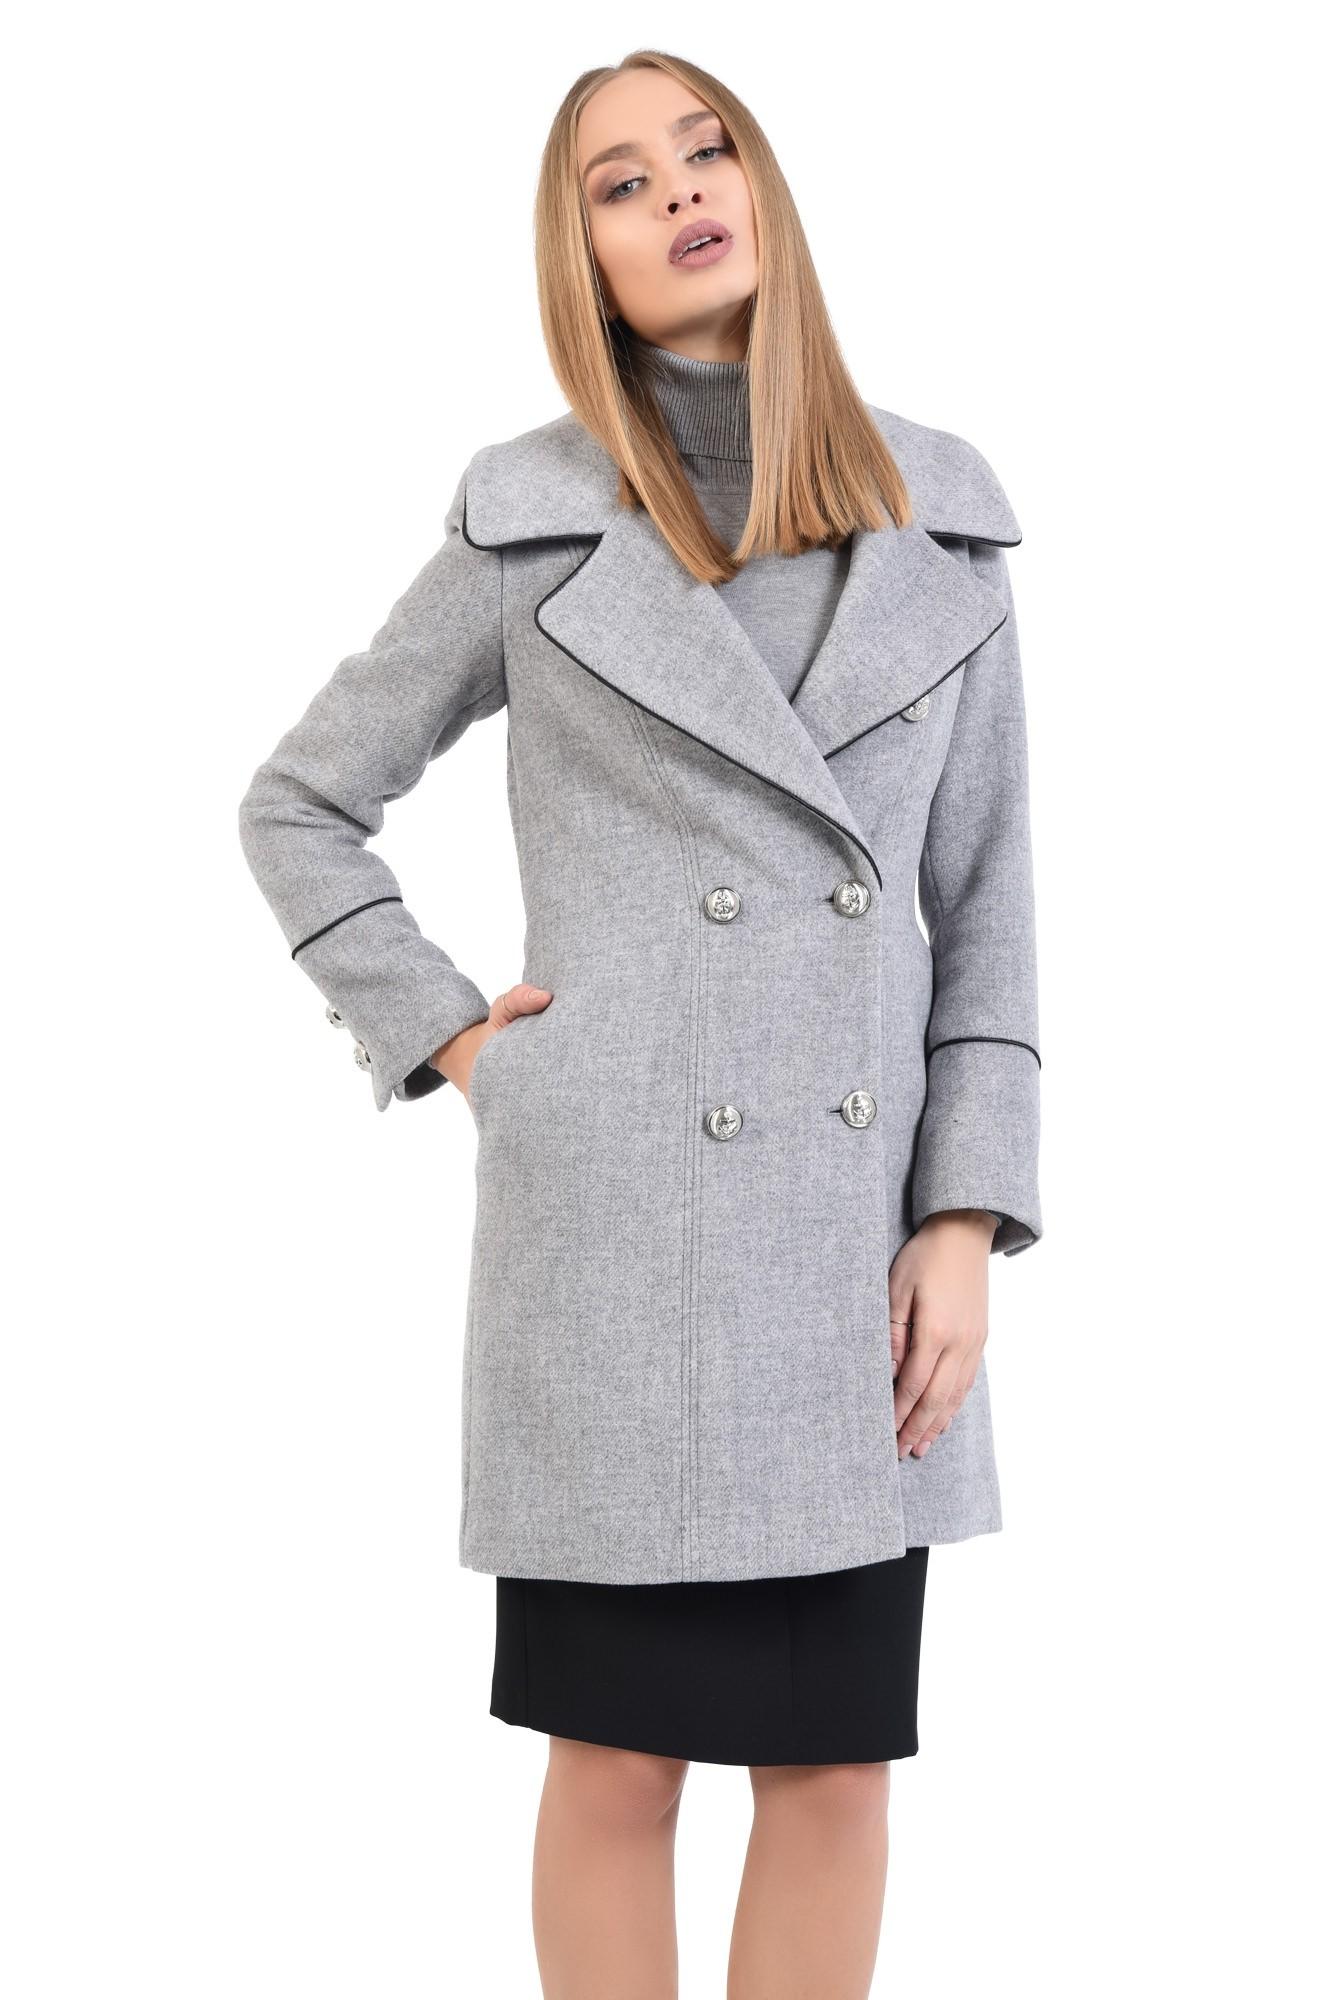 0 - palton casual, cambrat, buzunare in cusatura, revere late crestate